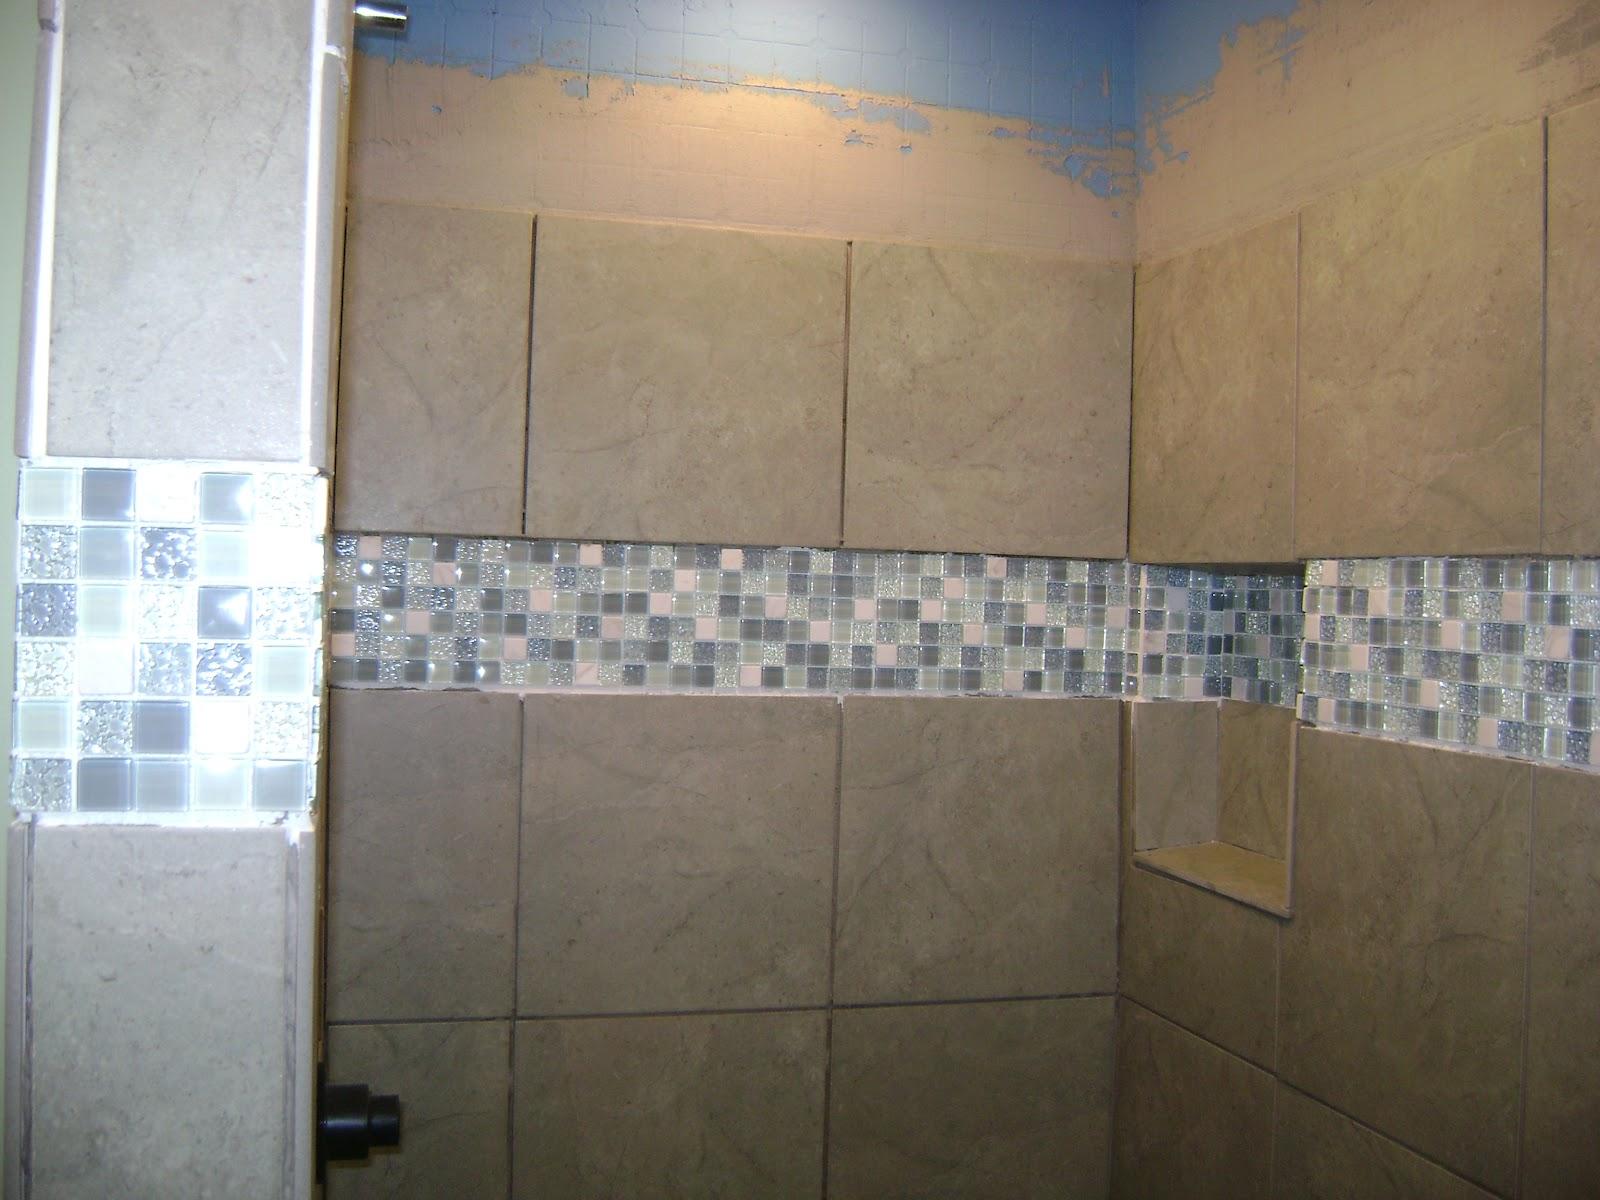 The last hideout bathroom remodel shower tile days 3 4 for Bathroom remodel in 3 days